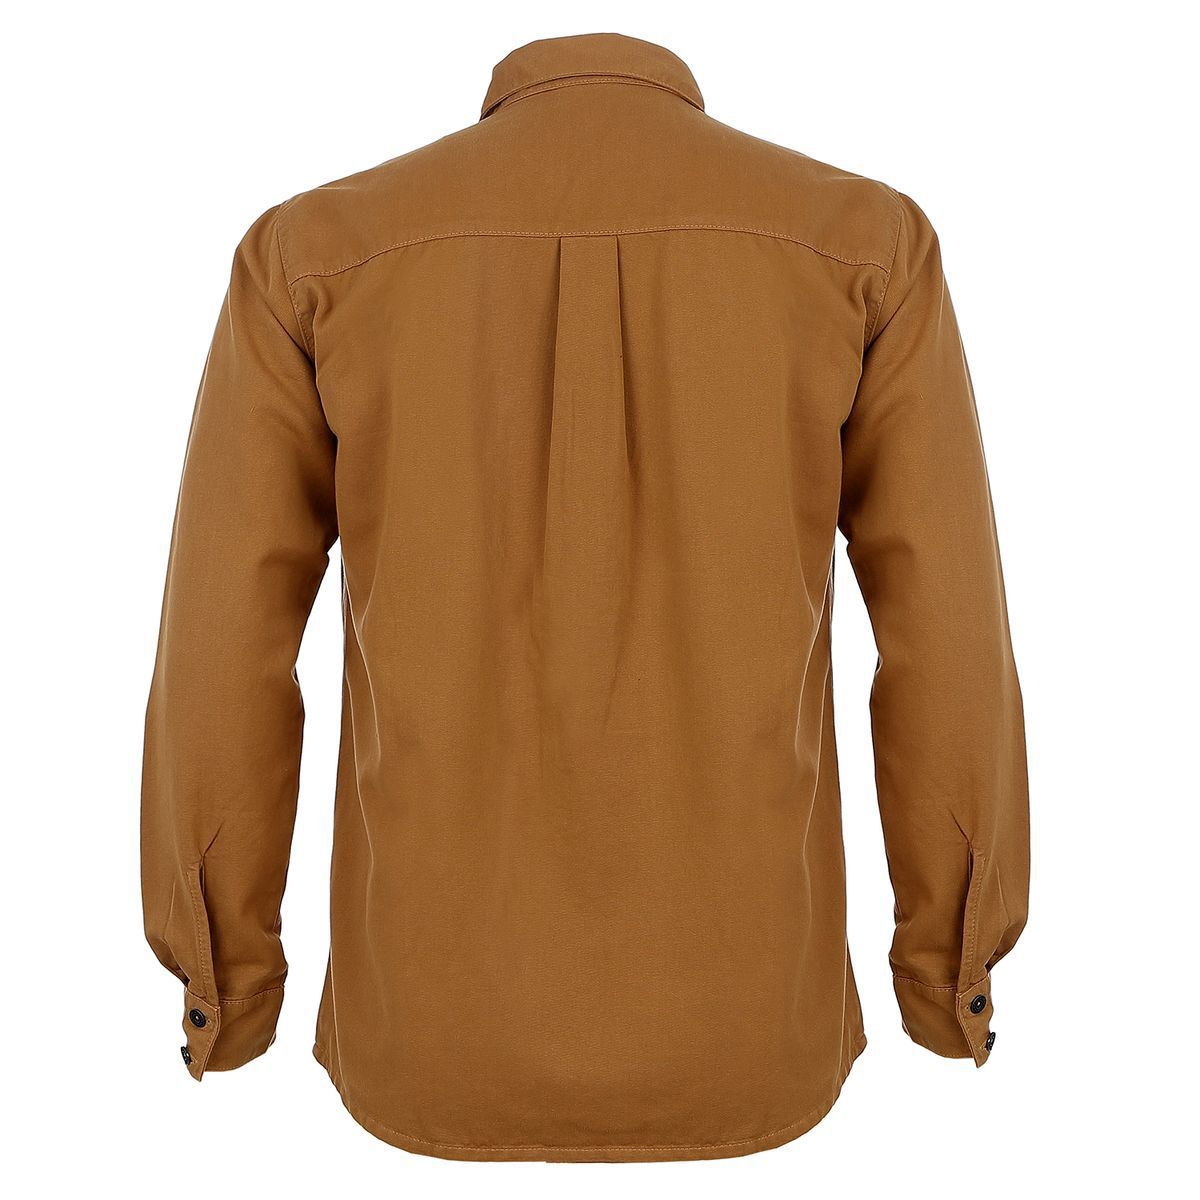 Camisa de Sarja Manga Longa Marrom